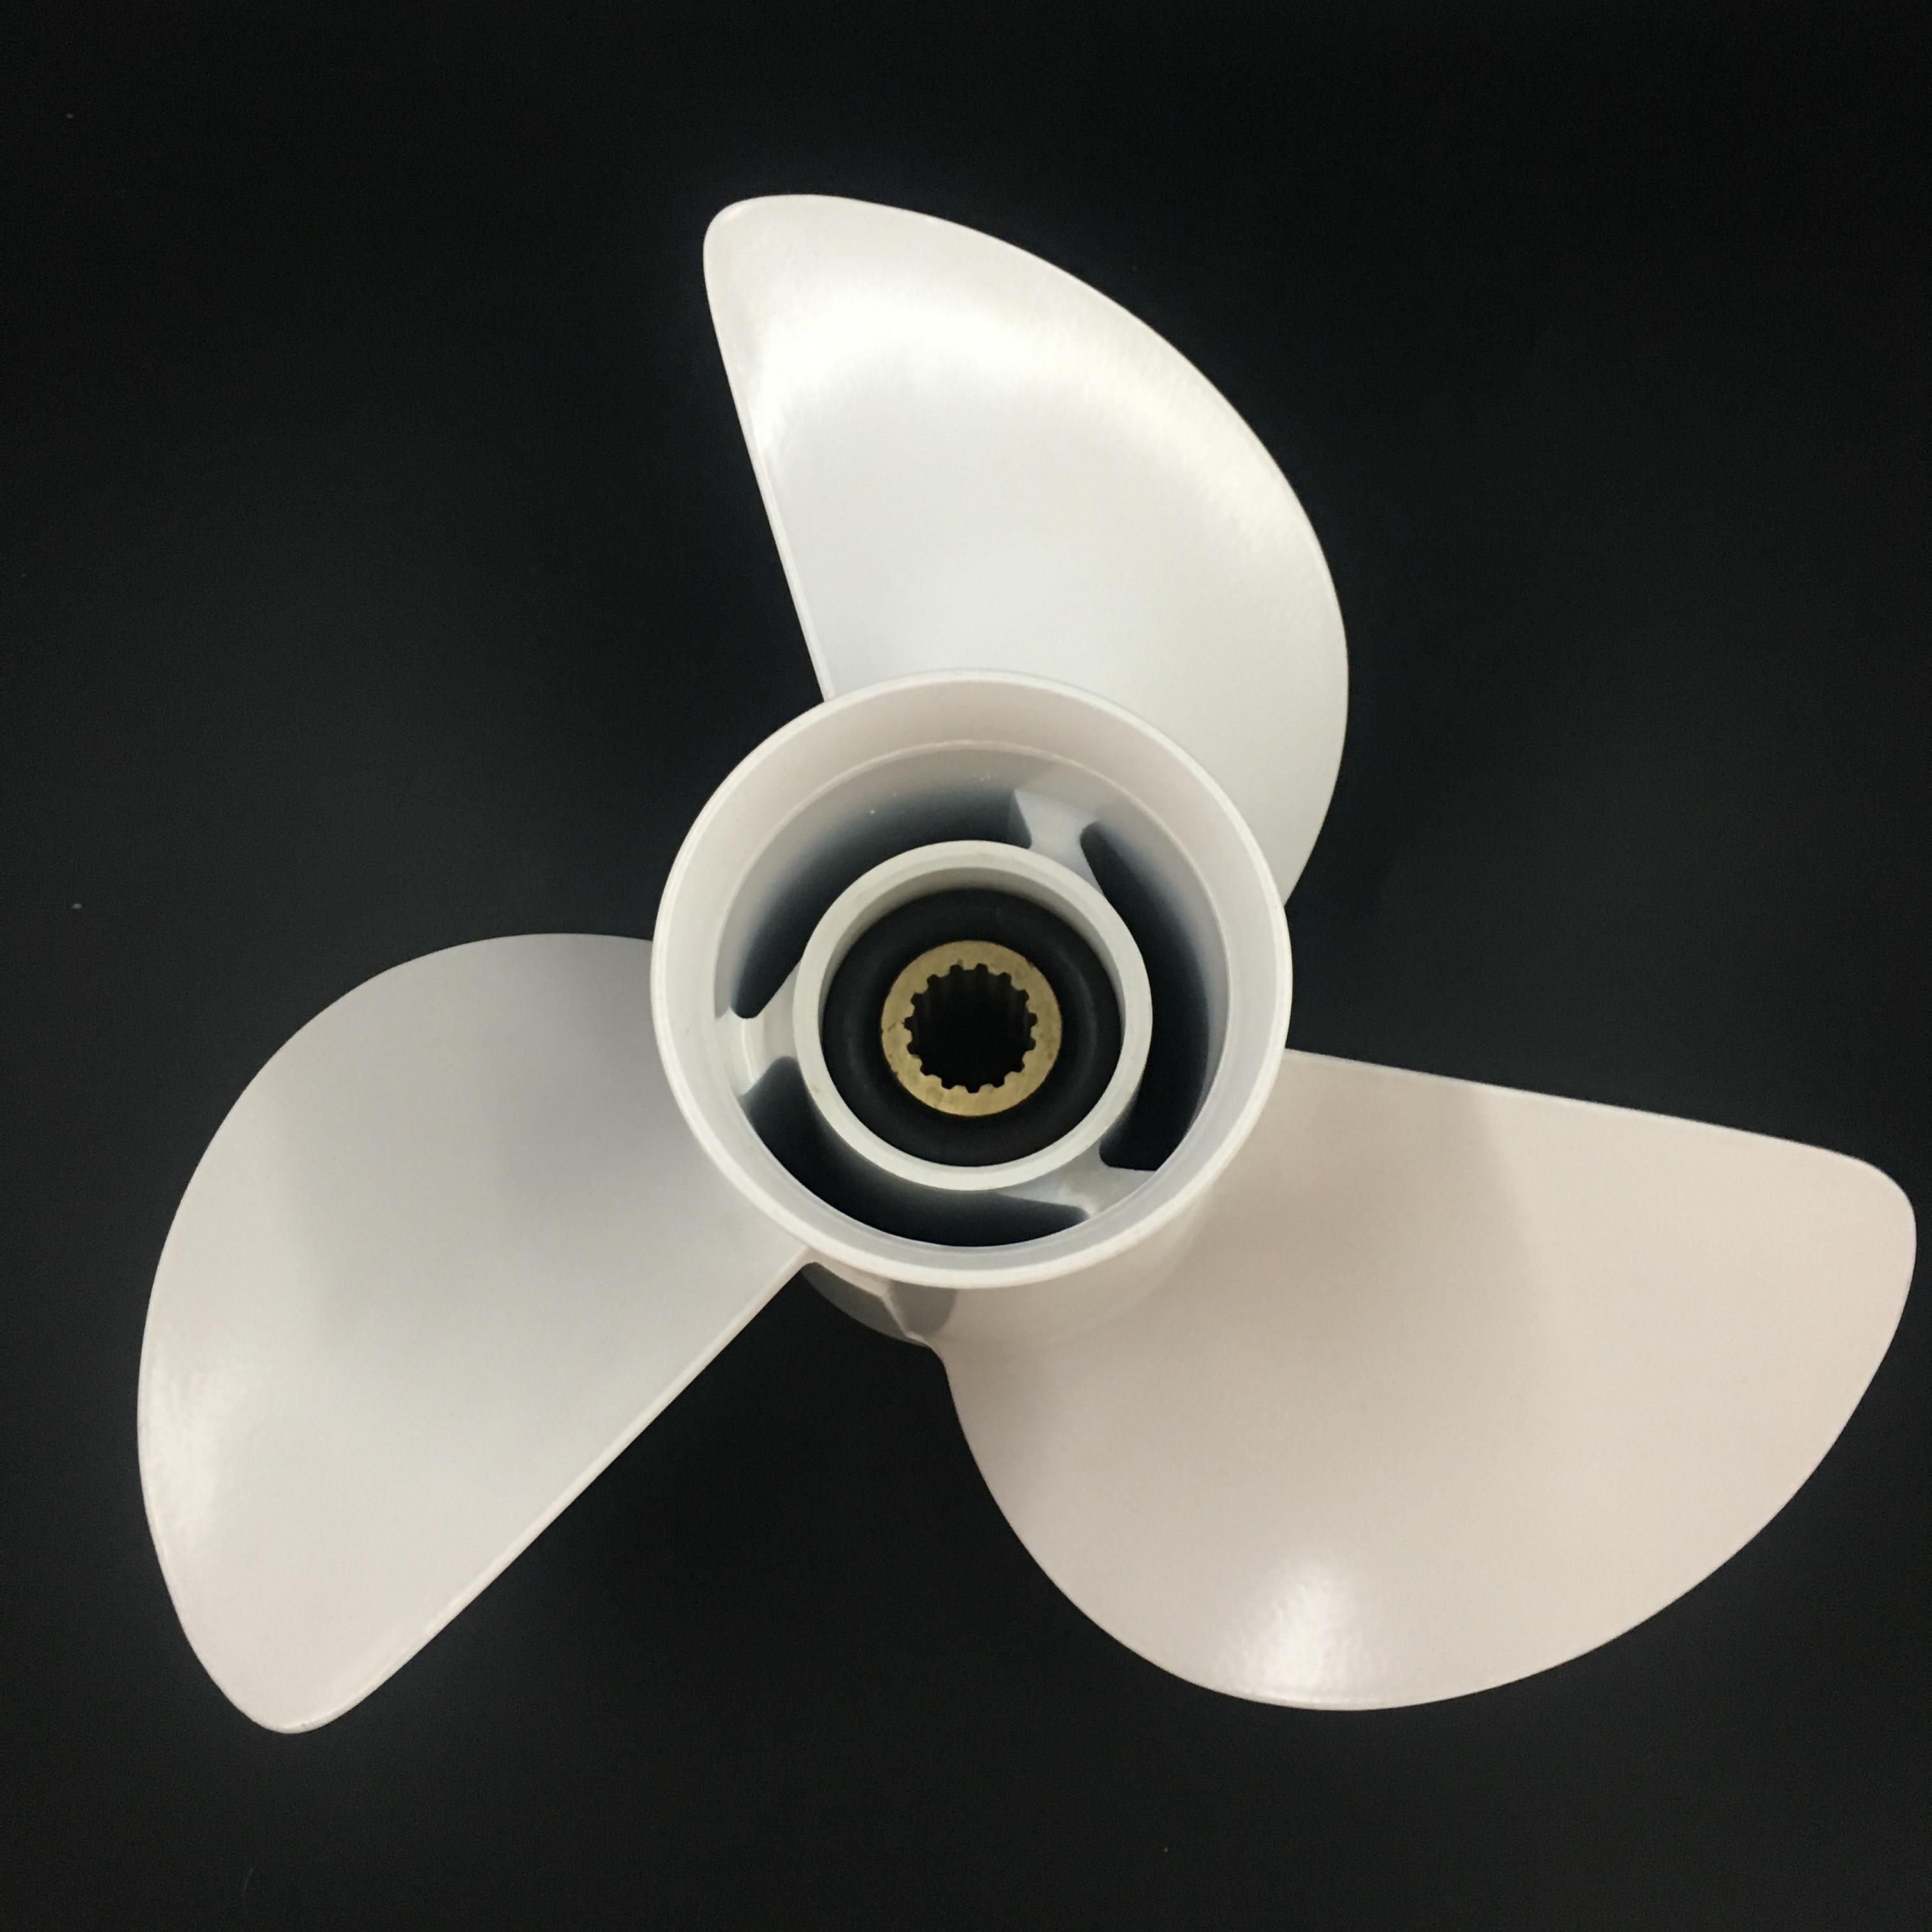 Boat propeller suit for Yamaha 13 5 8x13 aluminum prop 60-115HP  3 blade 15 tooth RH OEM No: 6E5-45949-00-EL enlarge